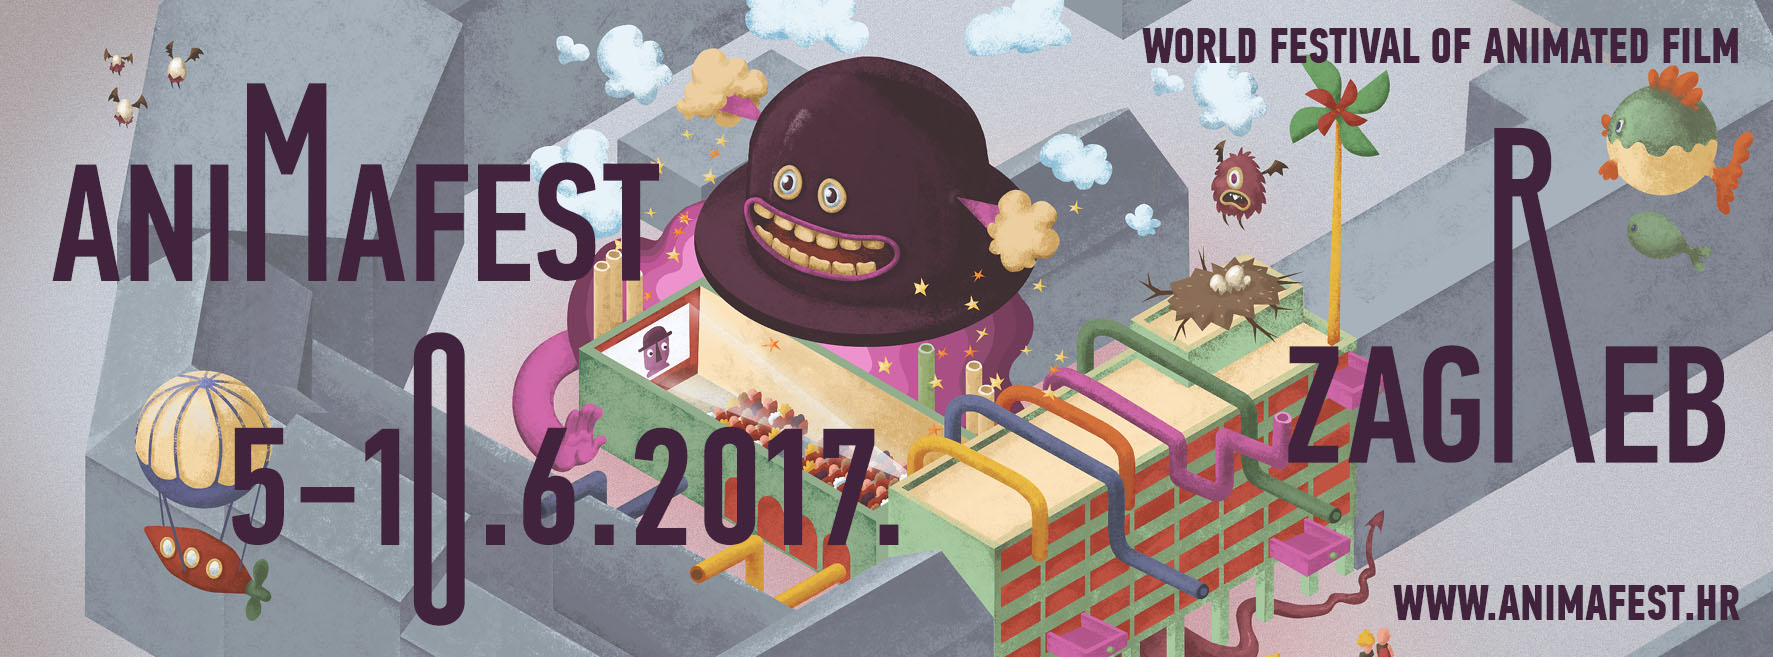 animafest2017